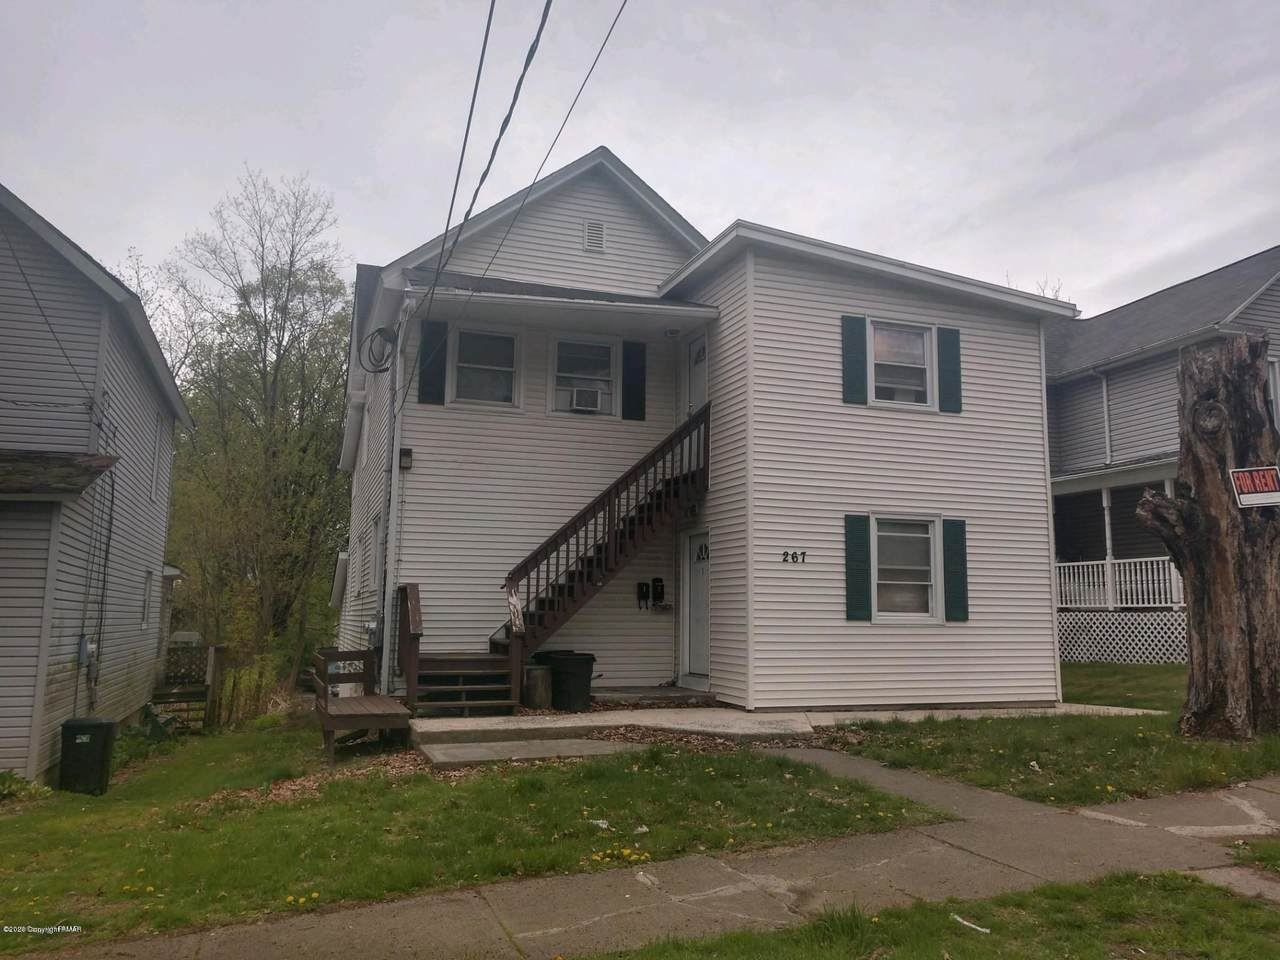 267 Brodhead Ave - Photo 1